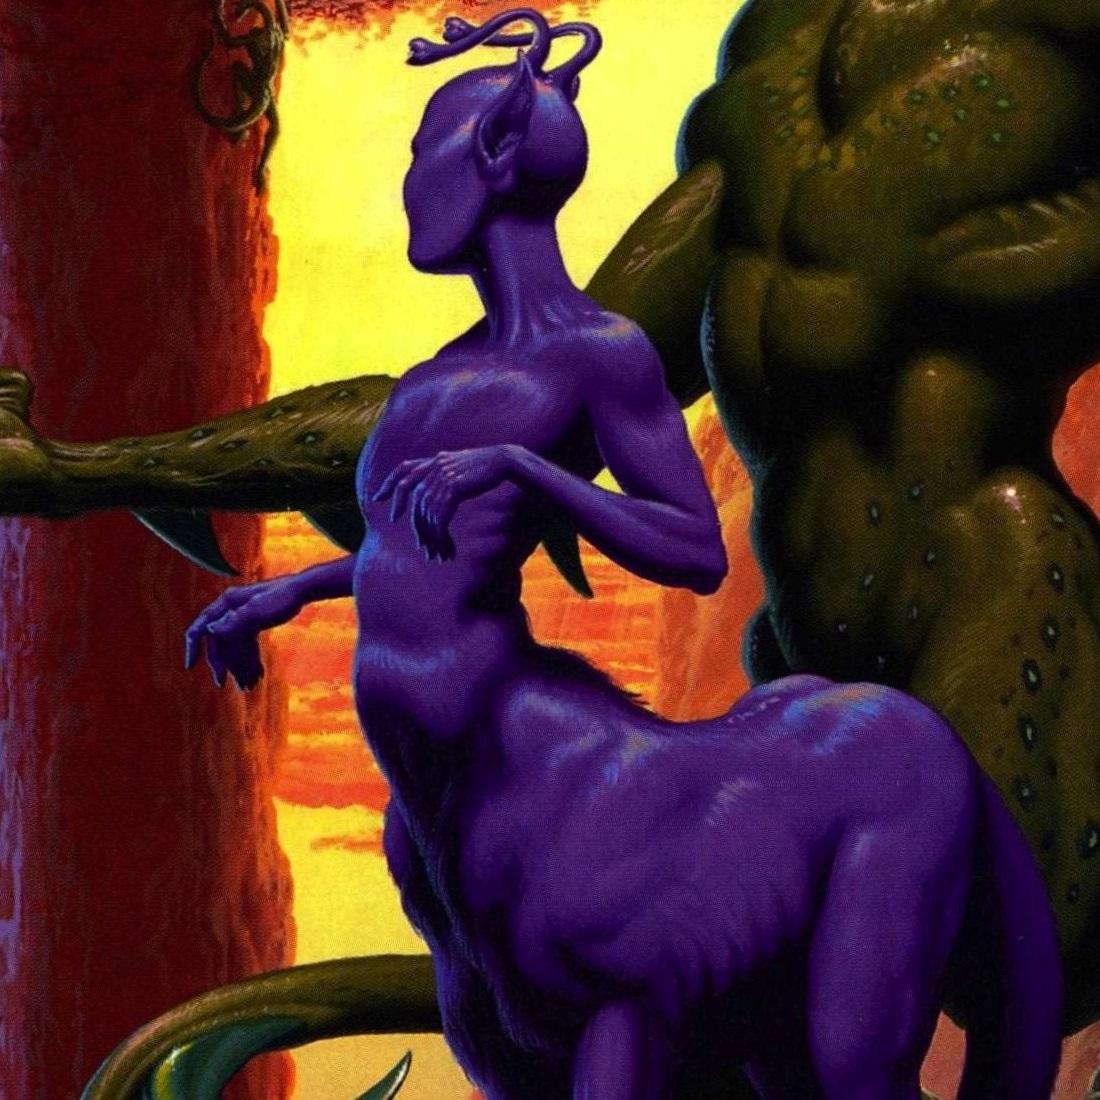 andalite purple